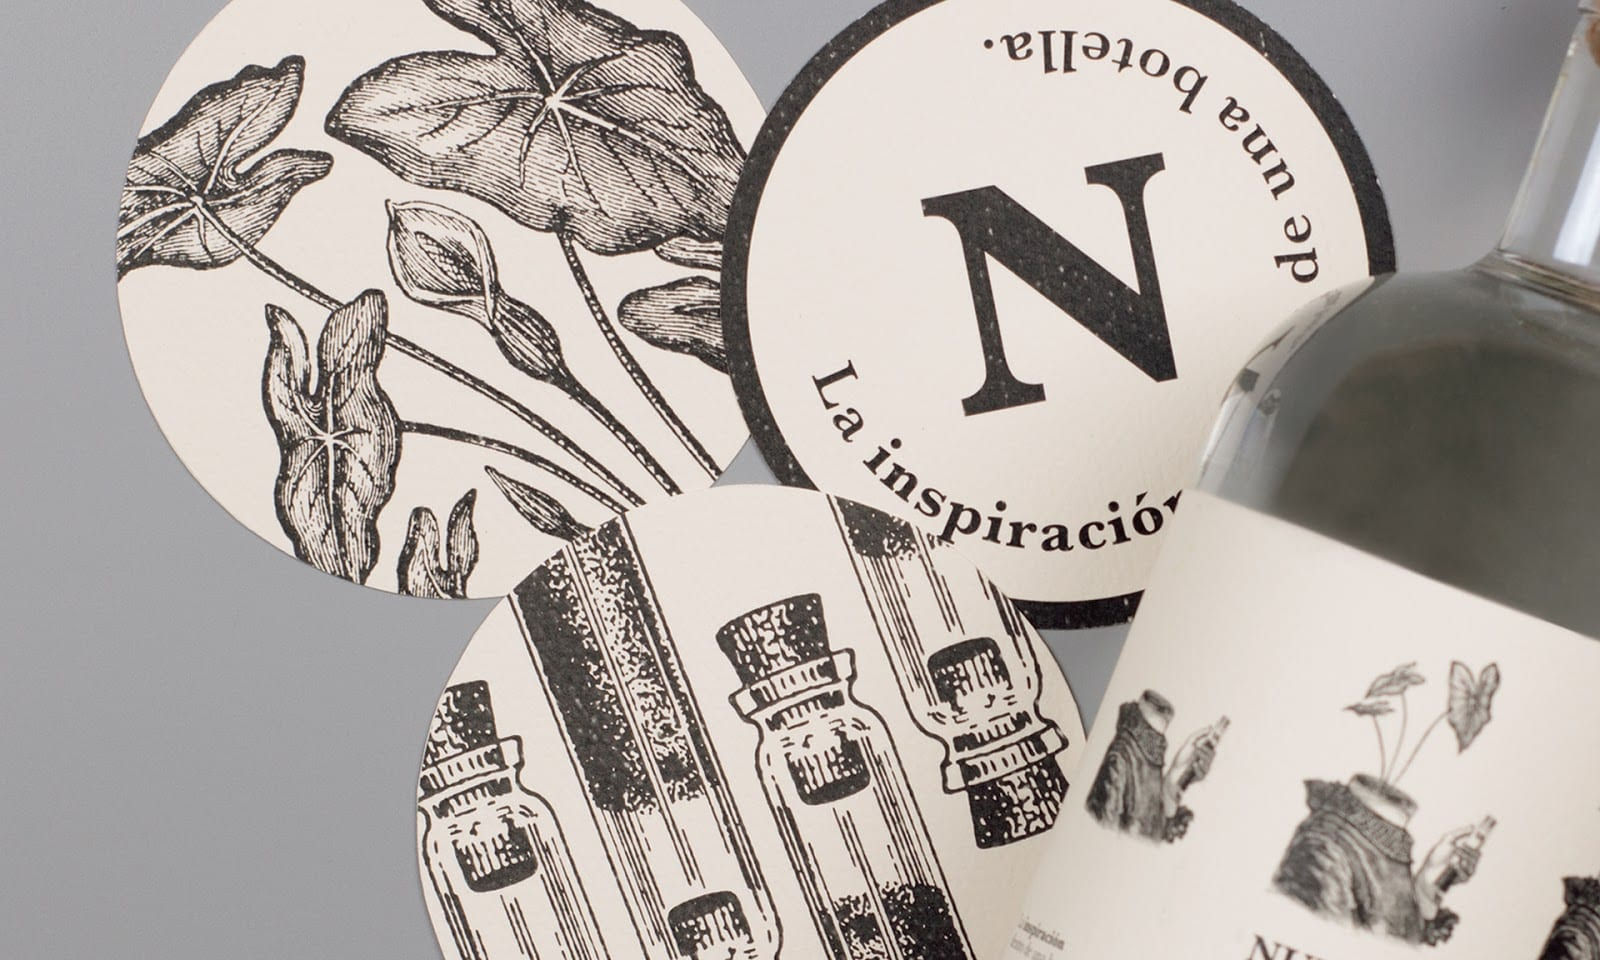 Numen Dry Gin 014 - Ach, tie obaly – Numen Dry Gin